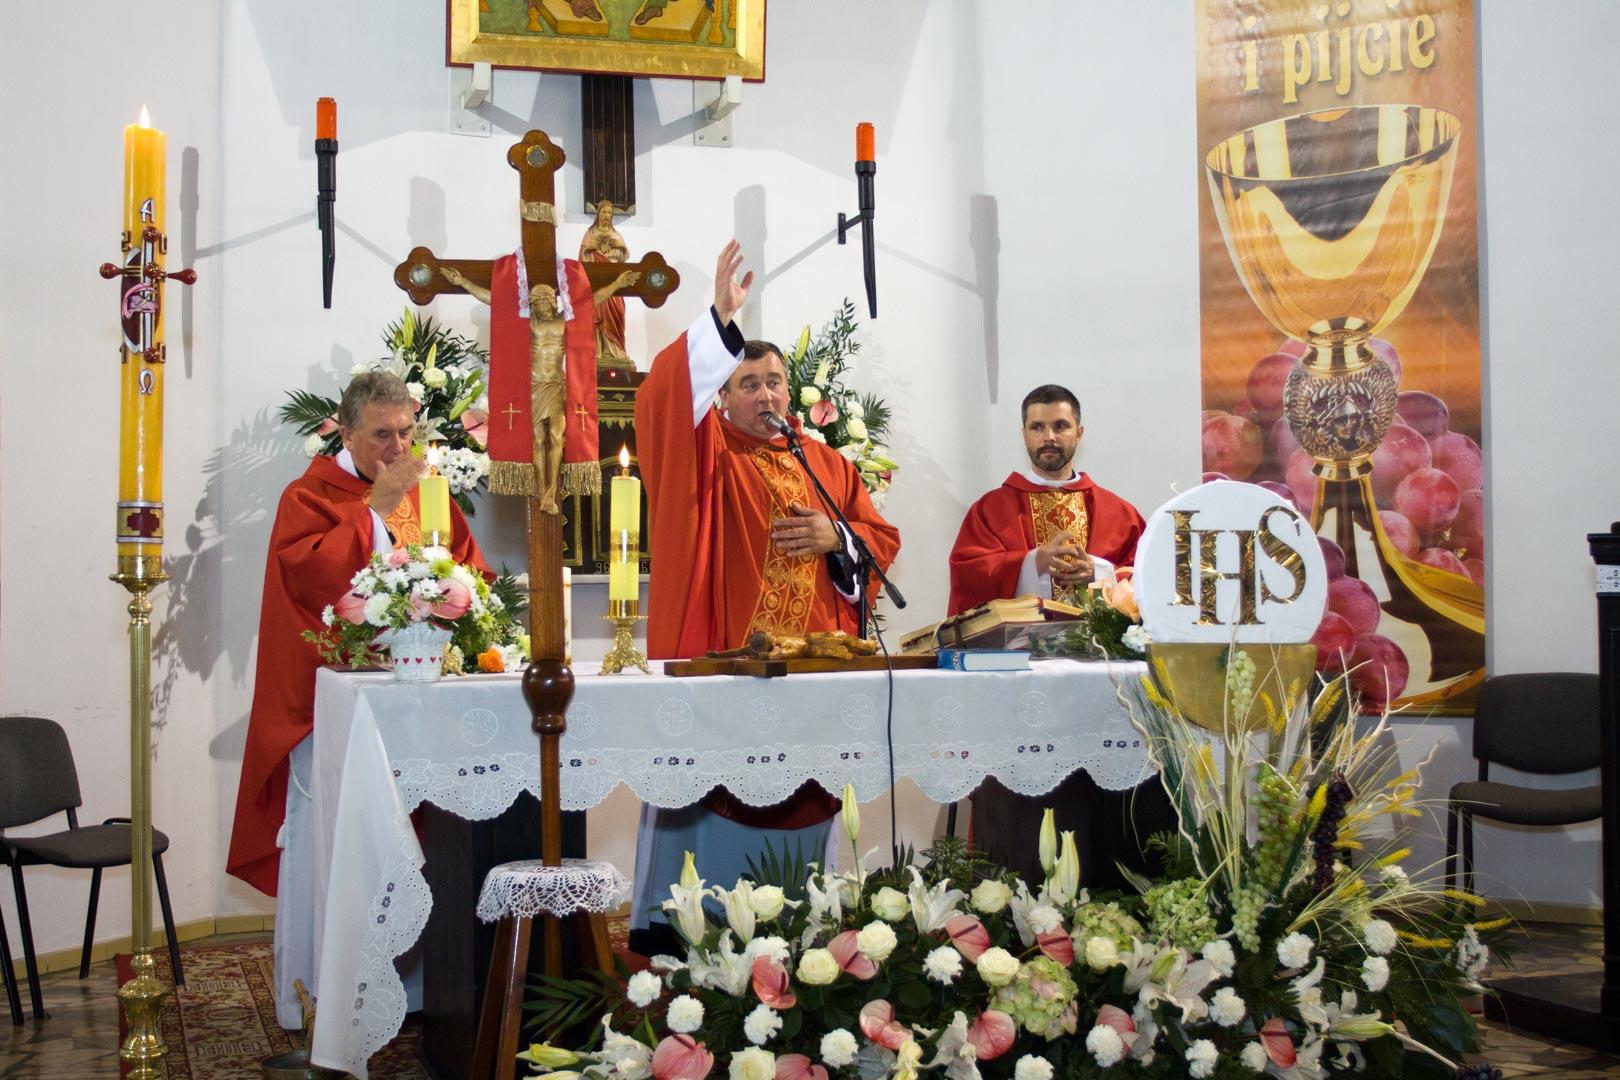 030-communion